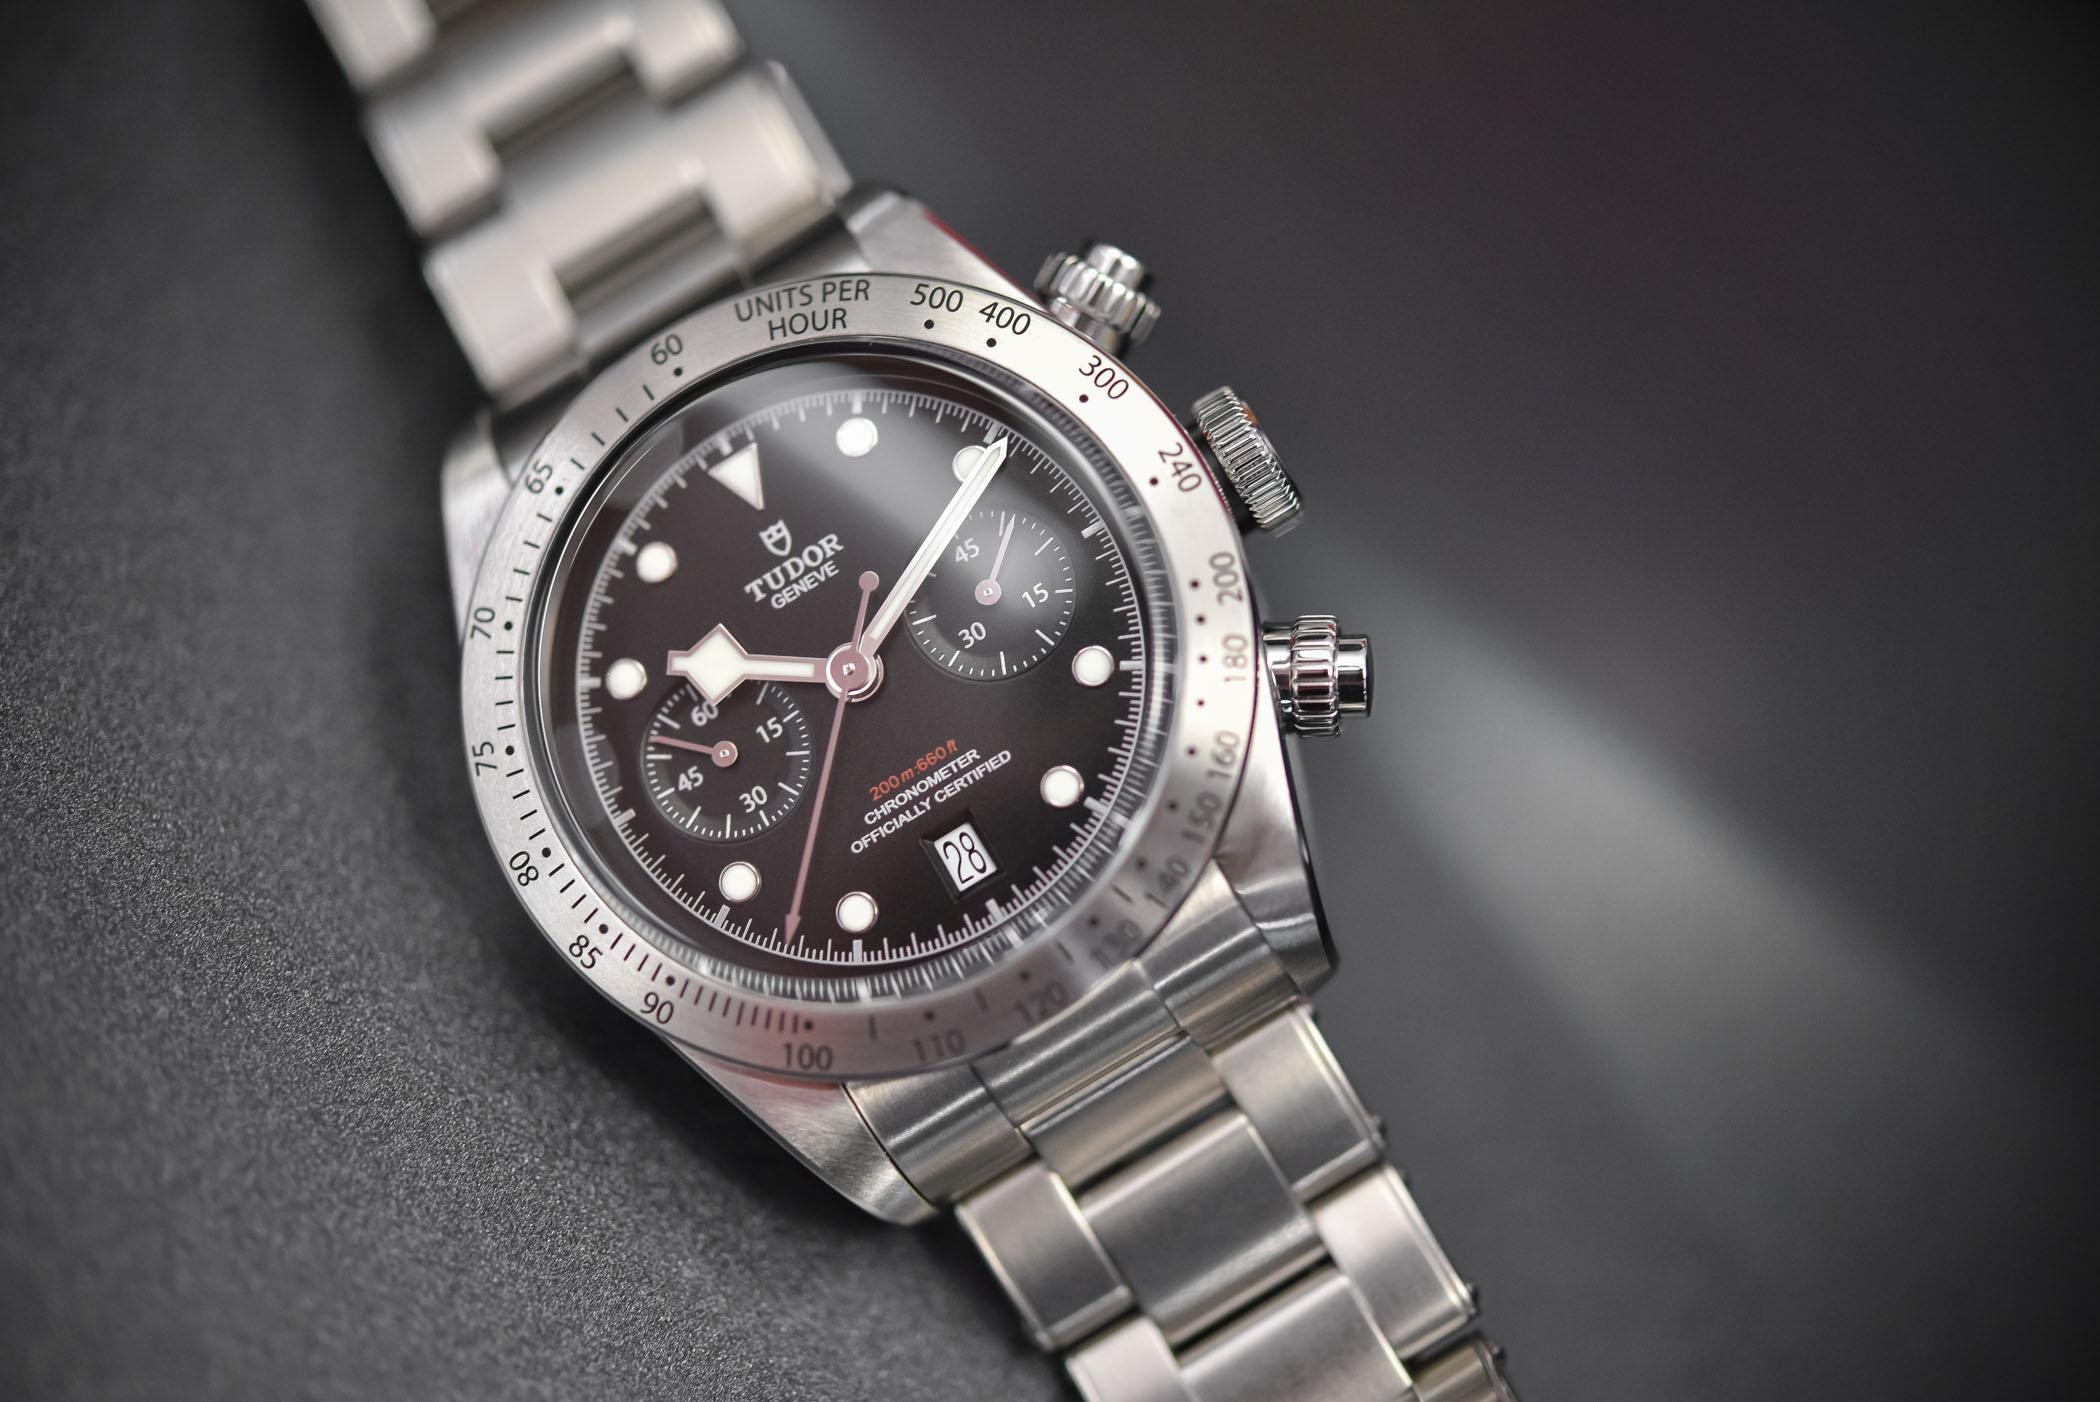 6162b25685e Review - Tudor Heritage Black Bay Chrono M79350 (Specs & Price)